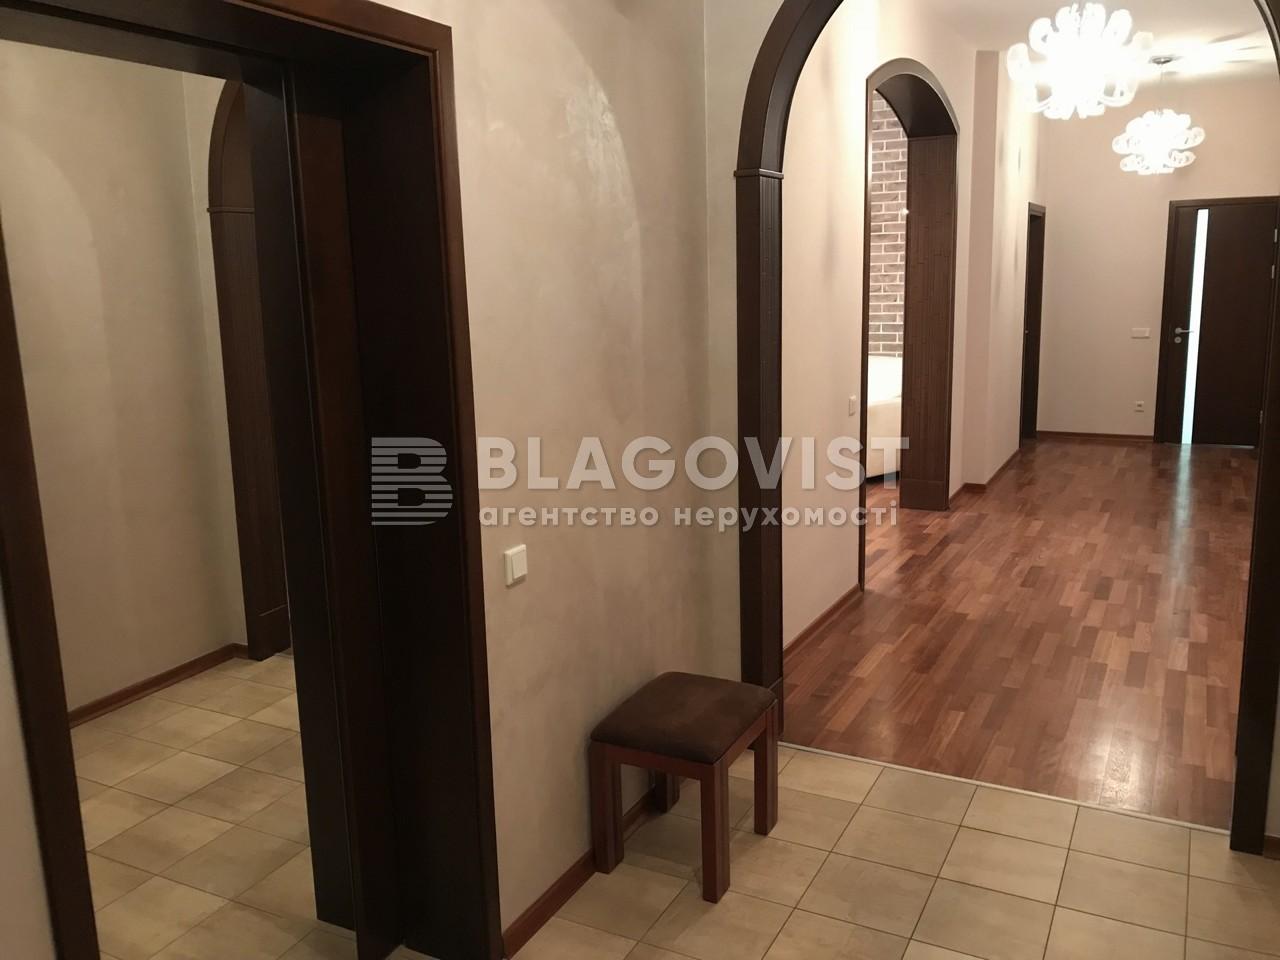 Квартира A-73479, Коновальца Евгения (Щорса), 32а, Киев - Фото 16